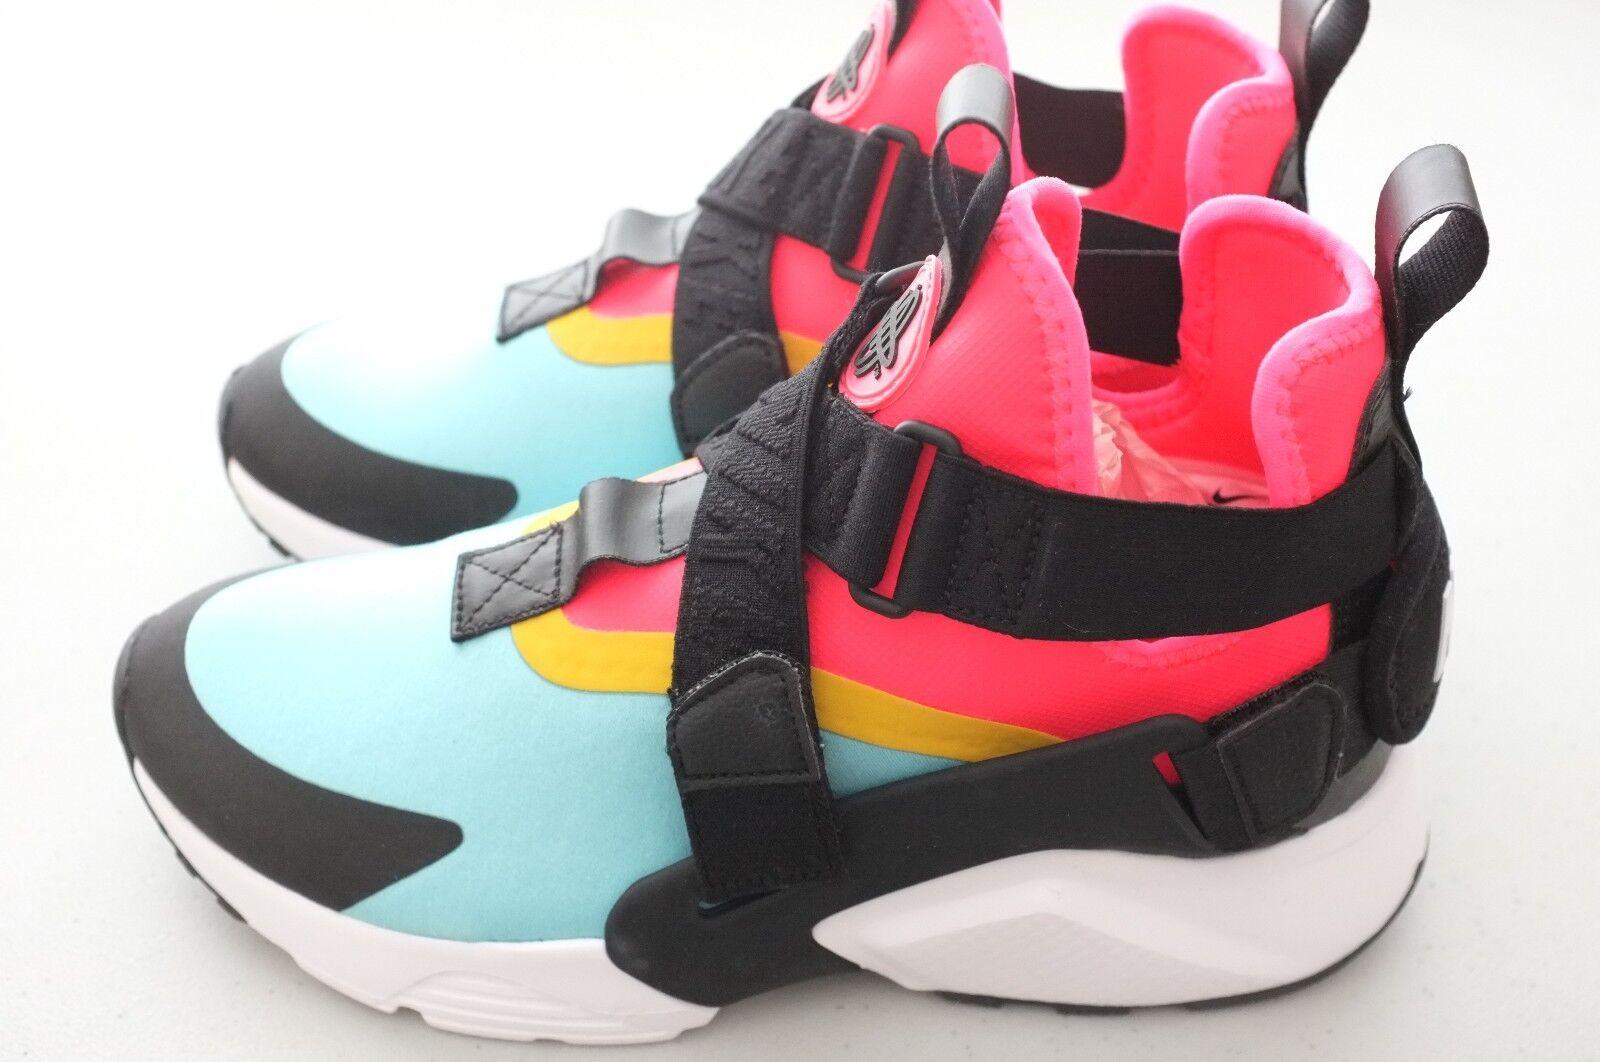 Nike Women Air Huarache City Athletic shoes Aqua Black Pink Sz 12.5 (AH6787-400)